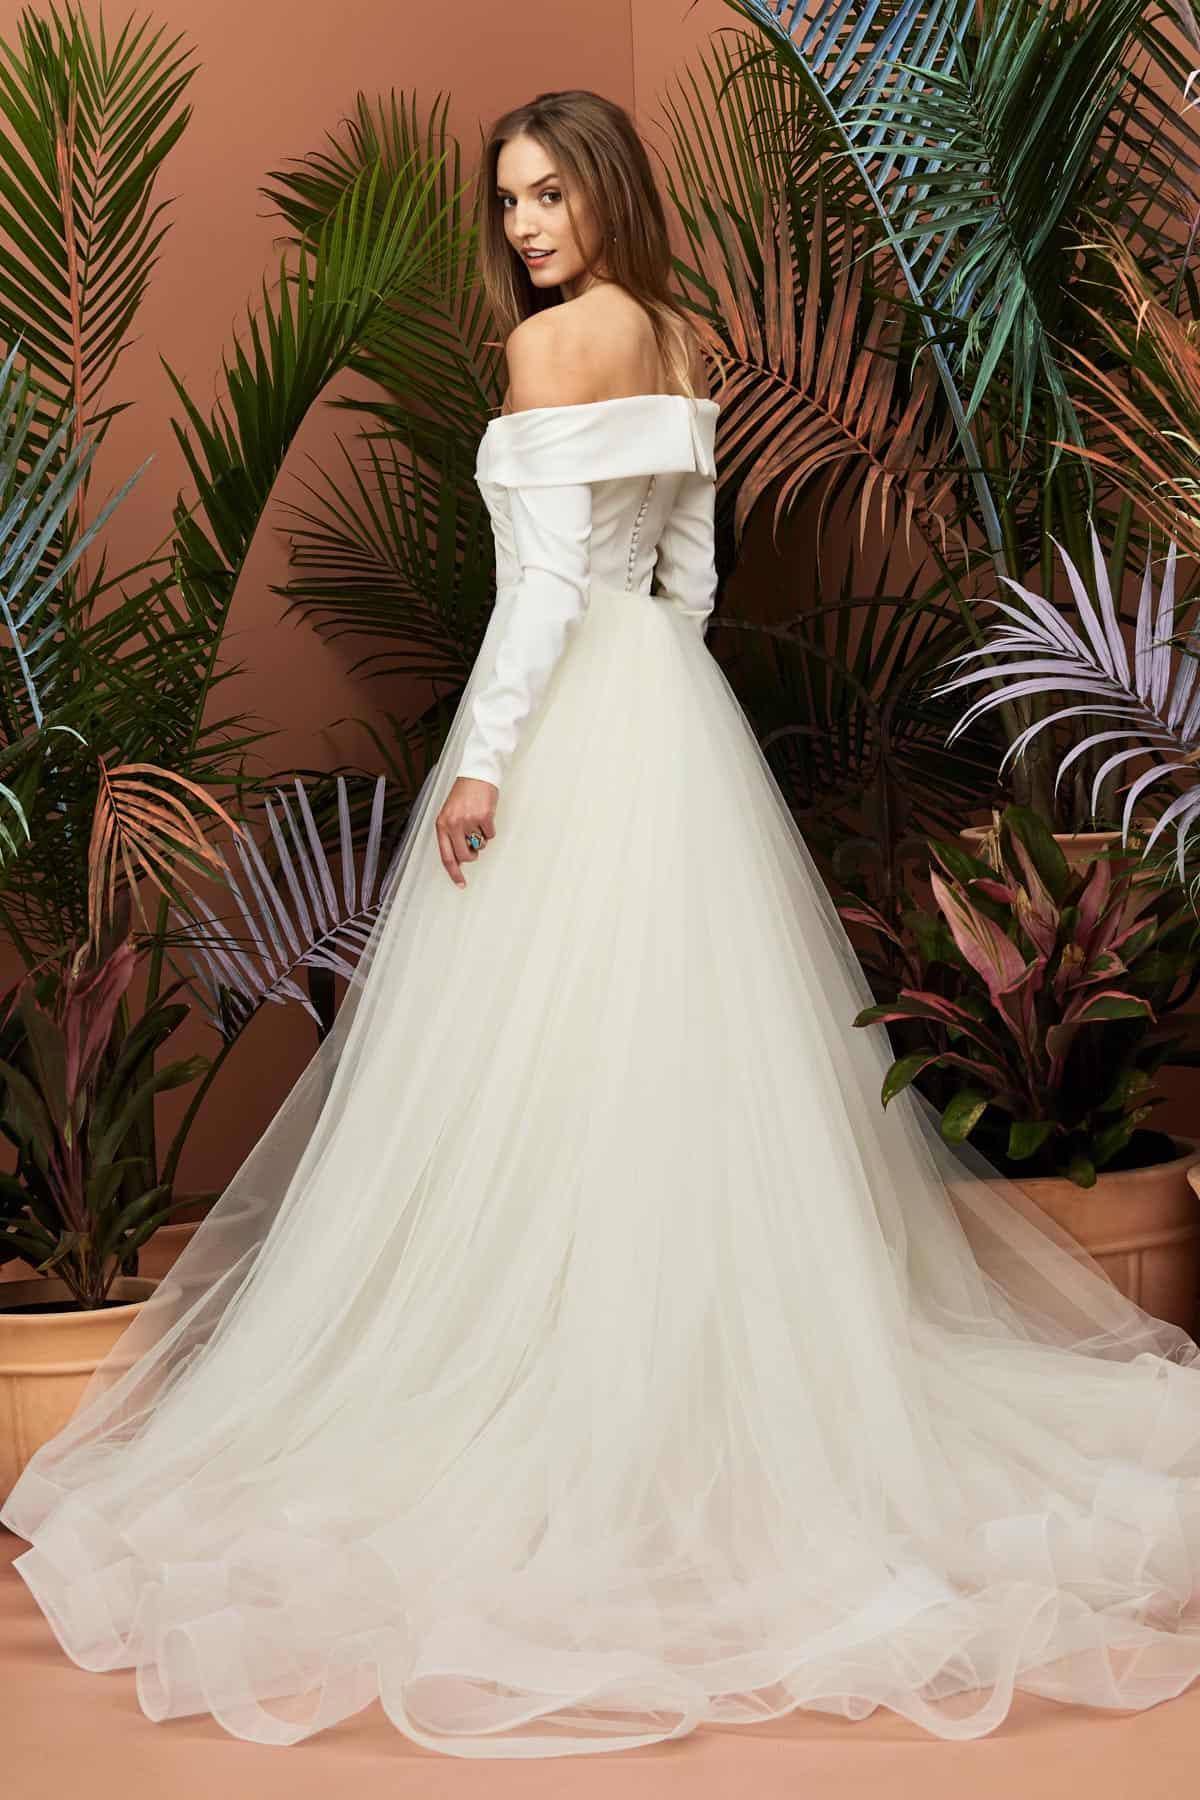 Casual Beach Wedding Guest Attire